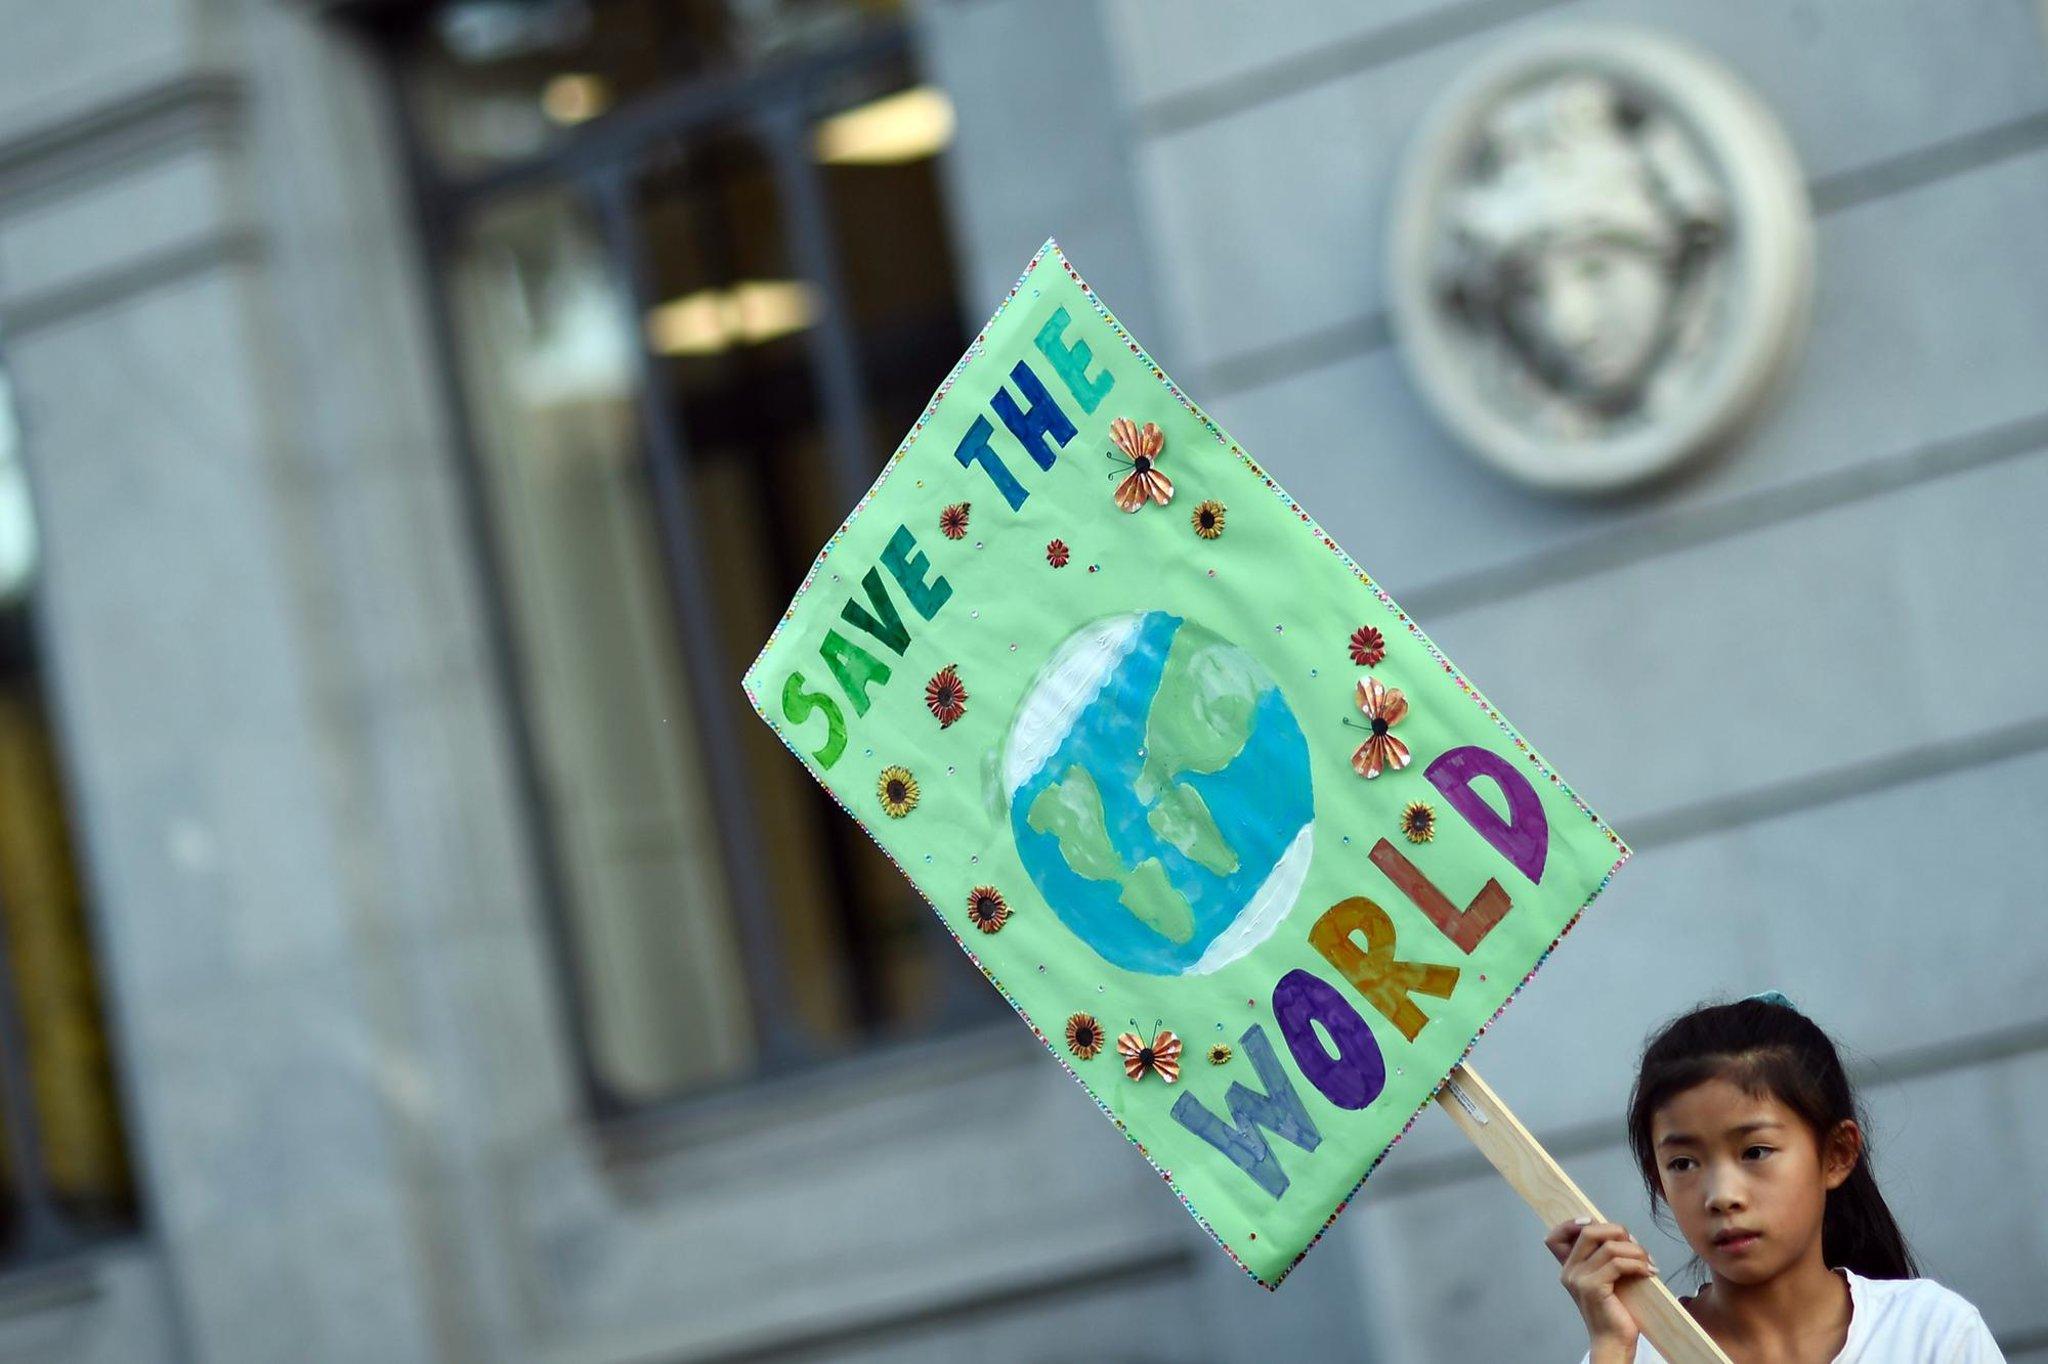 COP26: Darurat perubahan iklim menuntut urgensi tindakan yang sama seperti pandemi Covid tetapi itu tidak terjadi – Kirsty Duncan MP